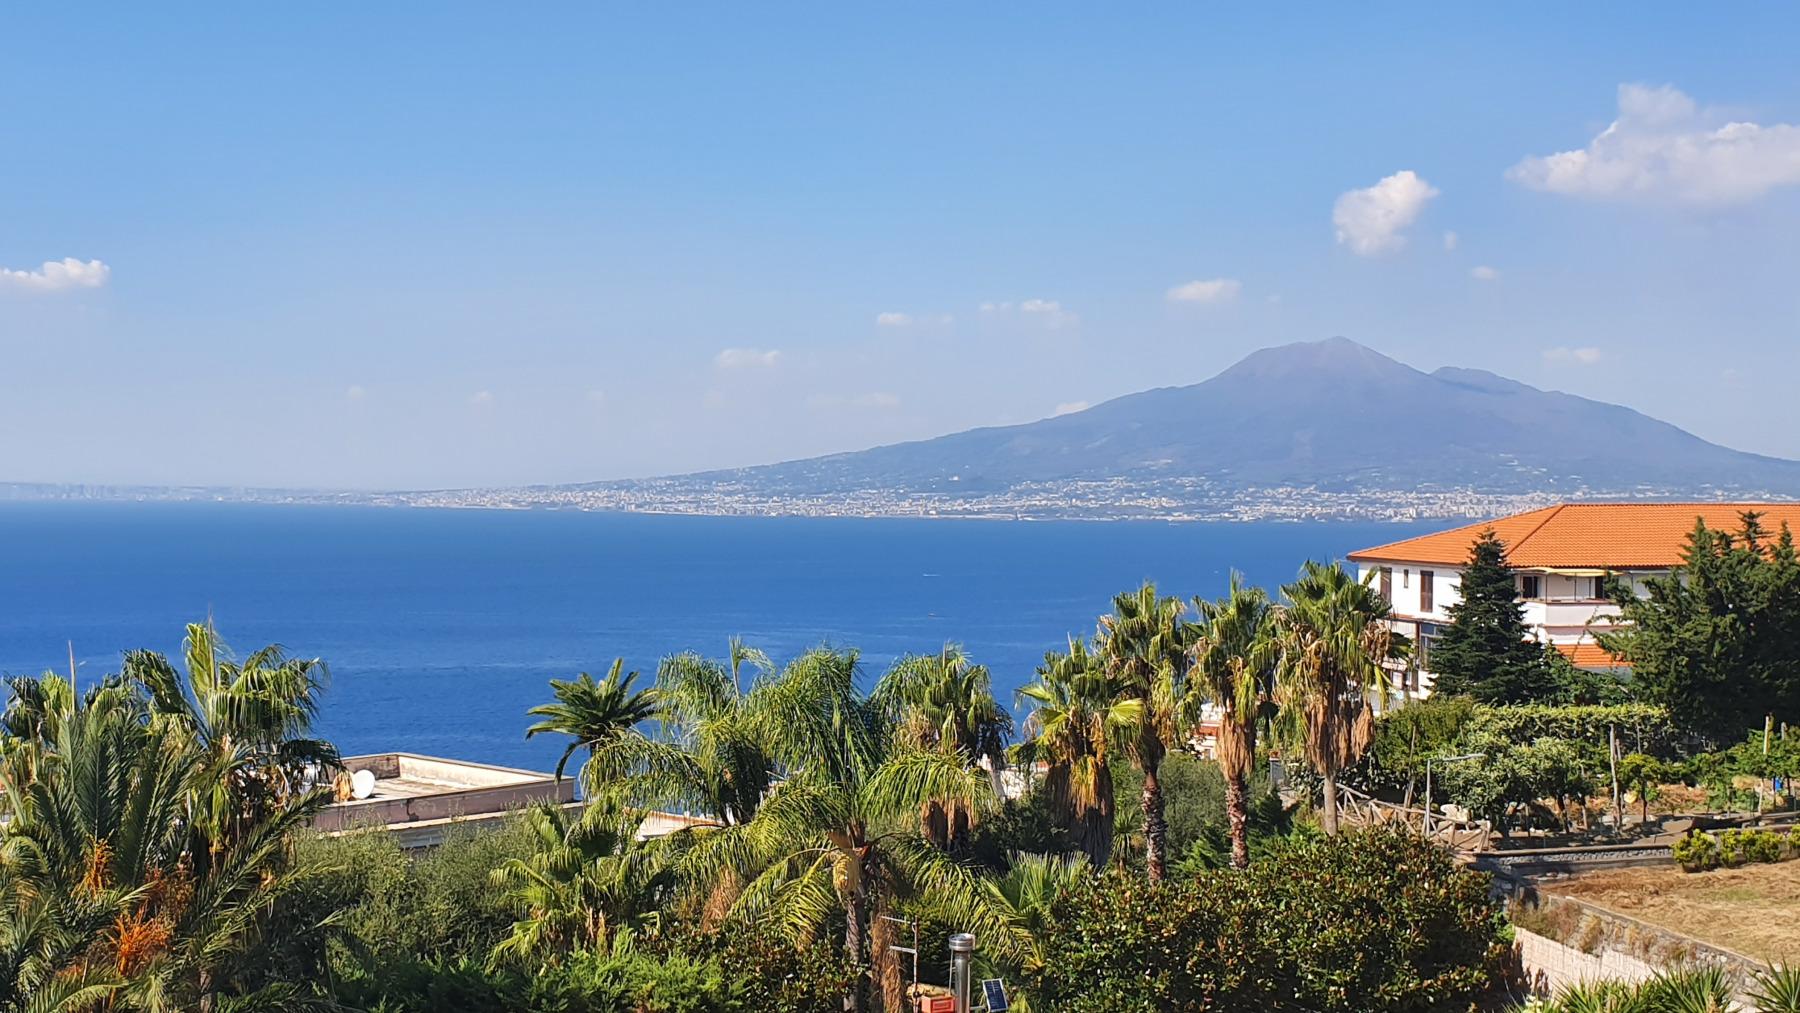 Vico Equense, uitzicht op de Vesuvius